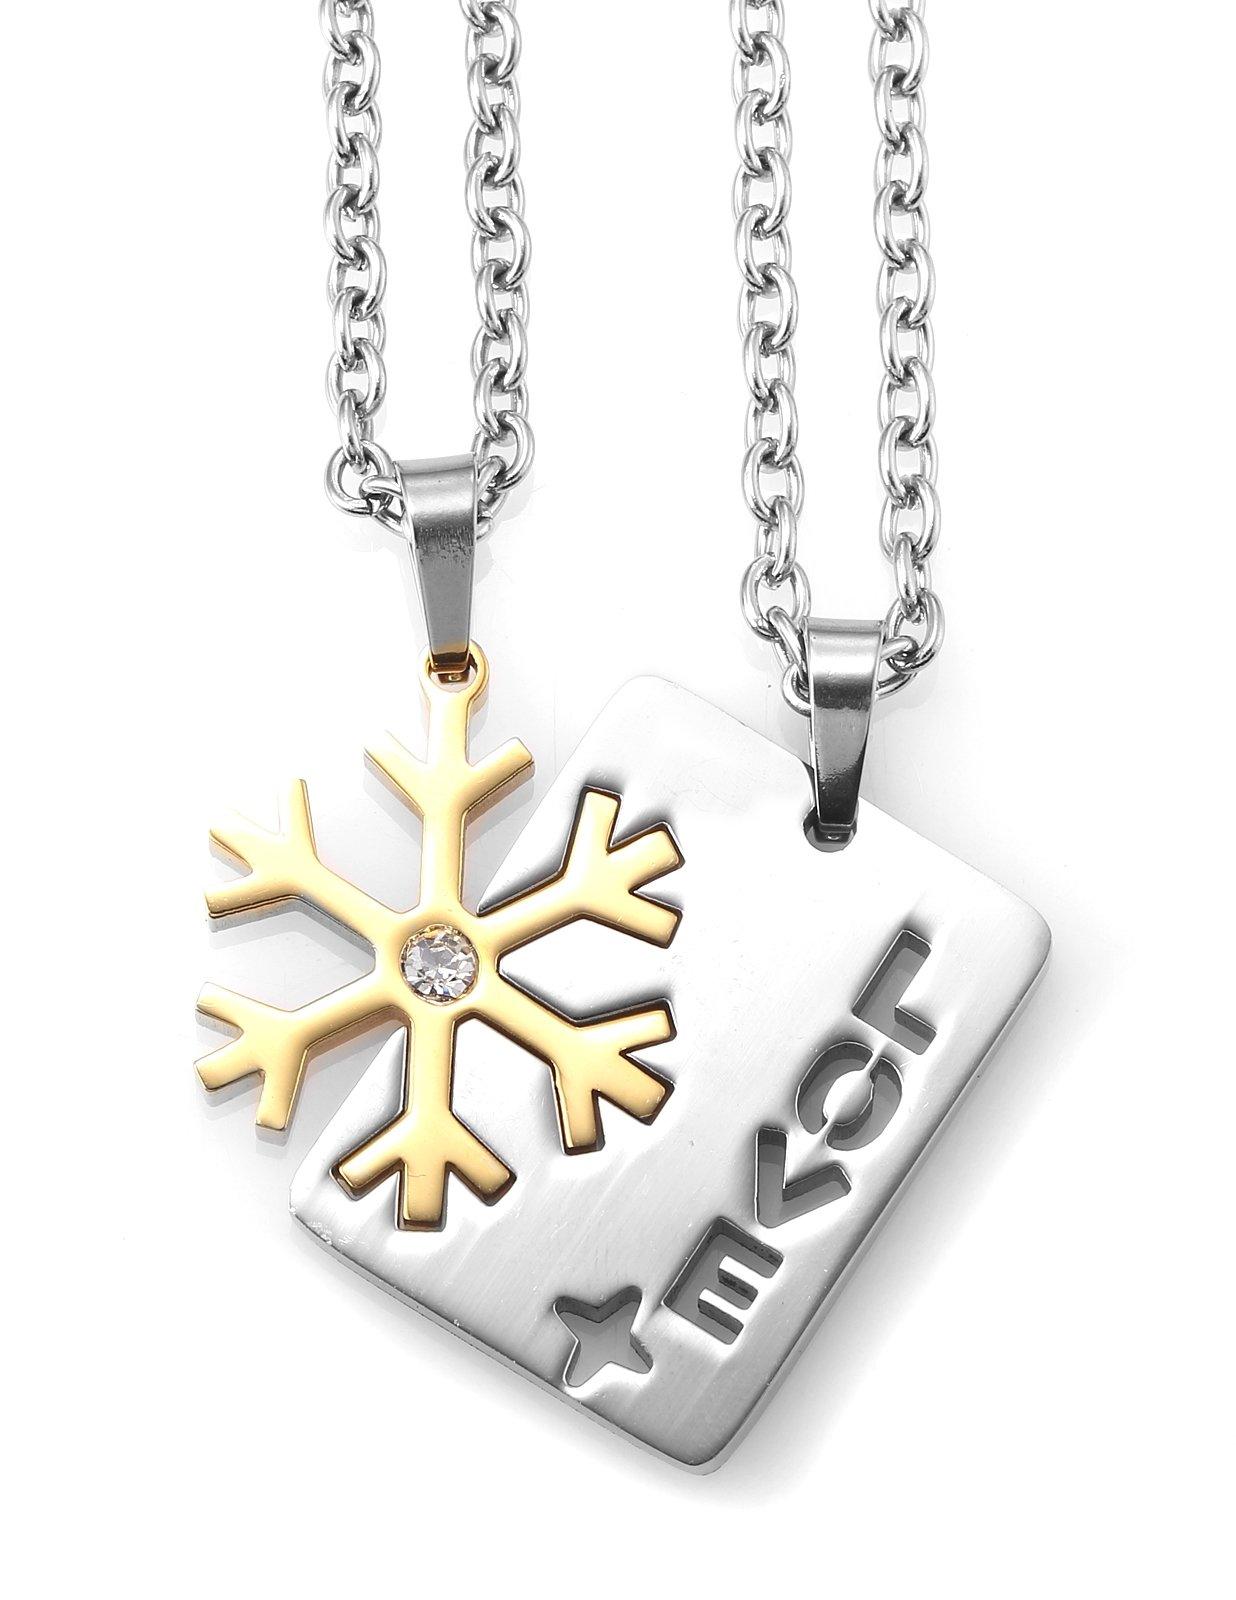 AgentX AAP148 Unisex Stainless Steel Golden Silver Snowflake Love Valentine Couple Pendants Necklace